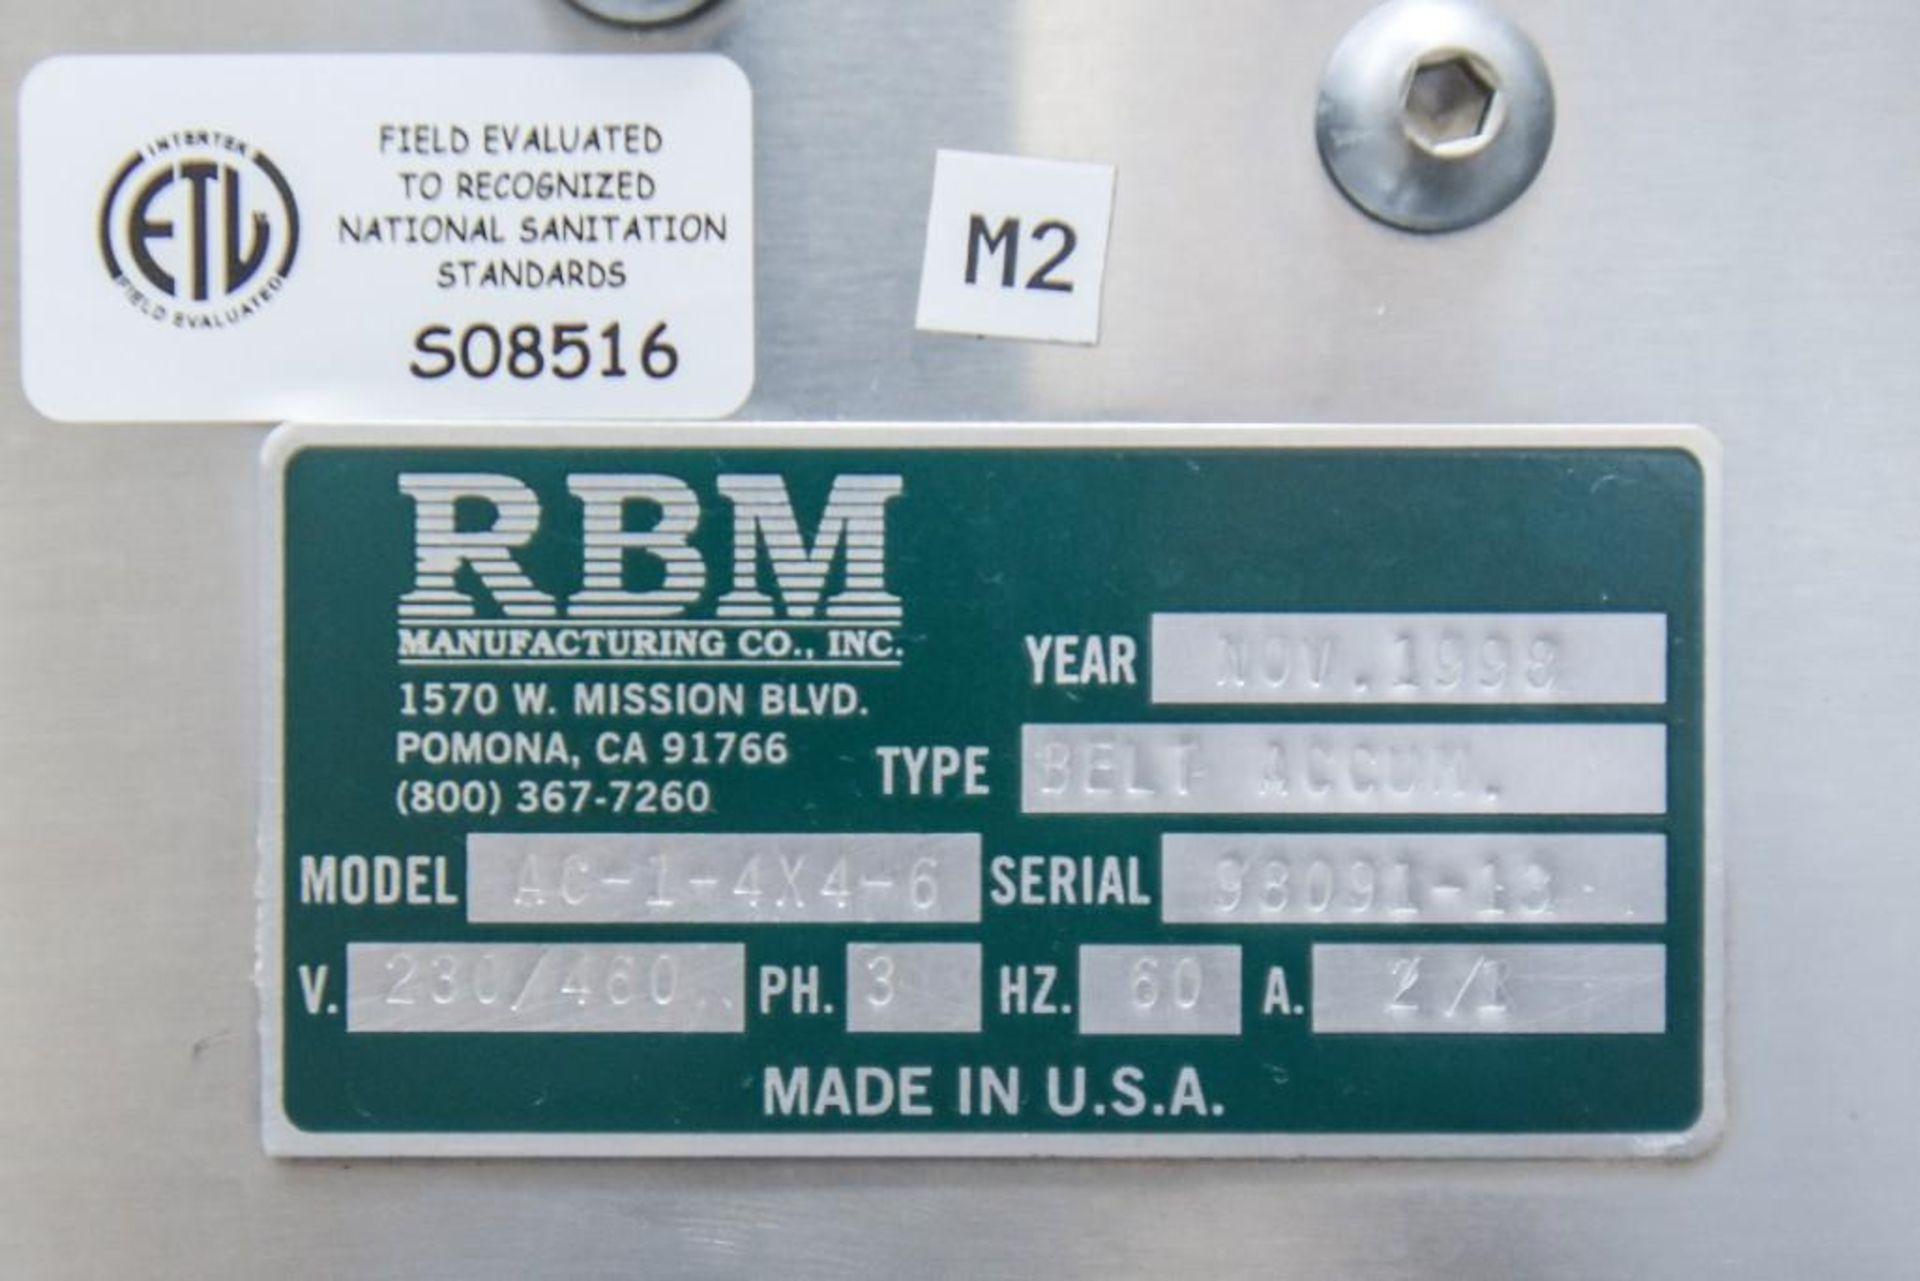 RBM Accumulation Hopper Conveyor and Vibratory Deck AC-1-4X4-6 - Image 11 of 11